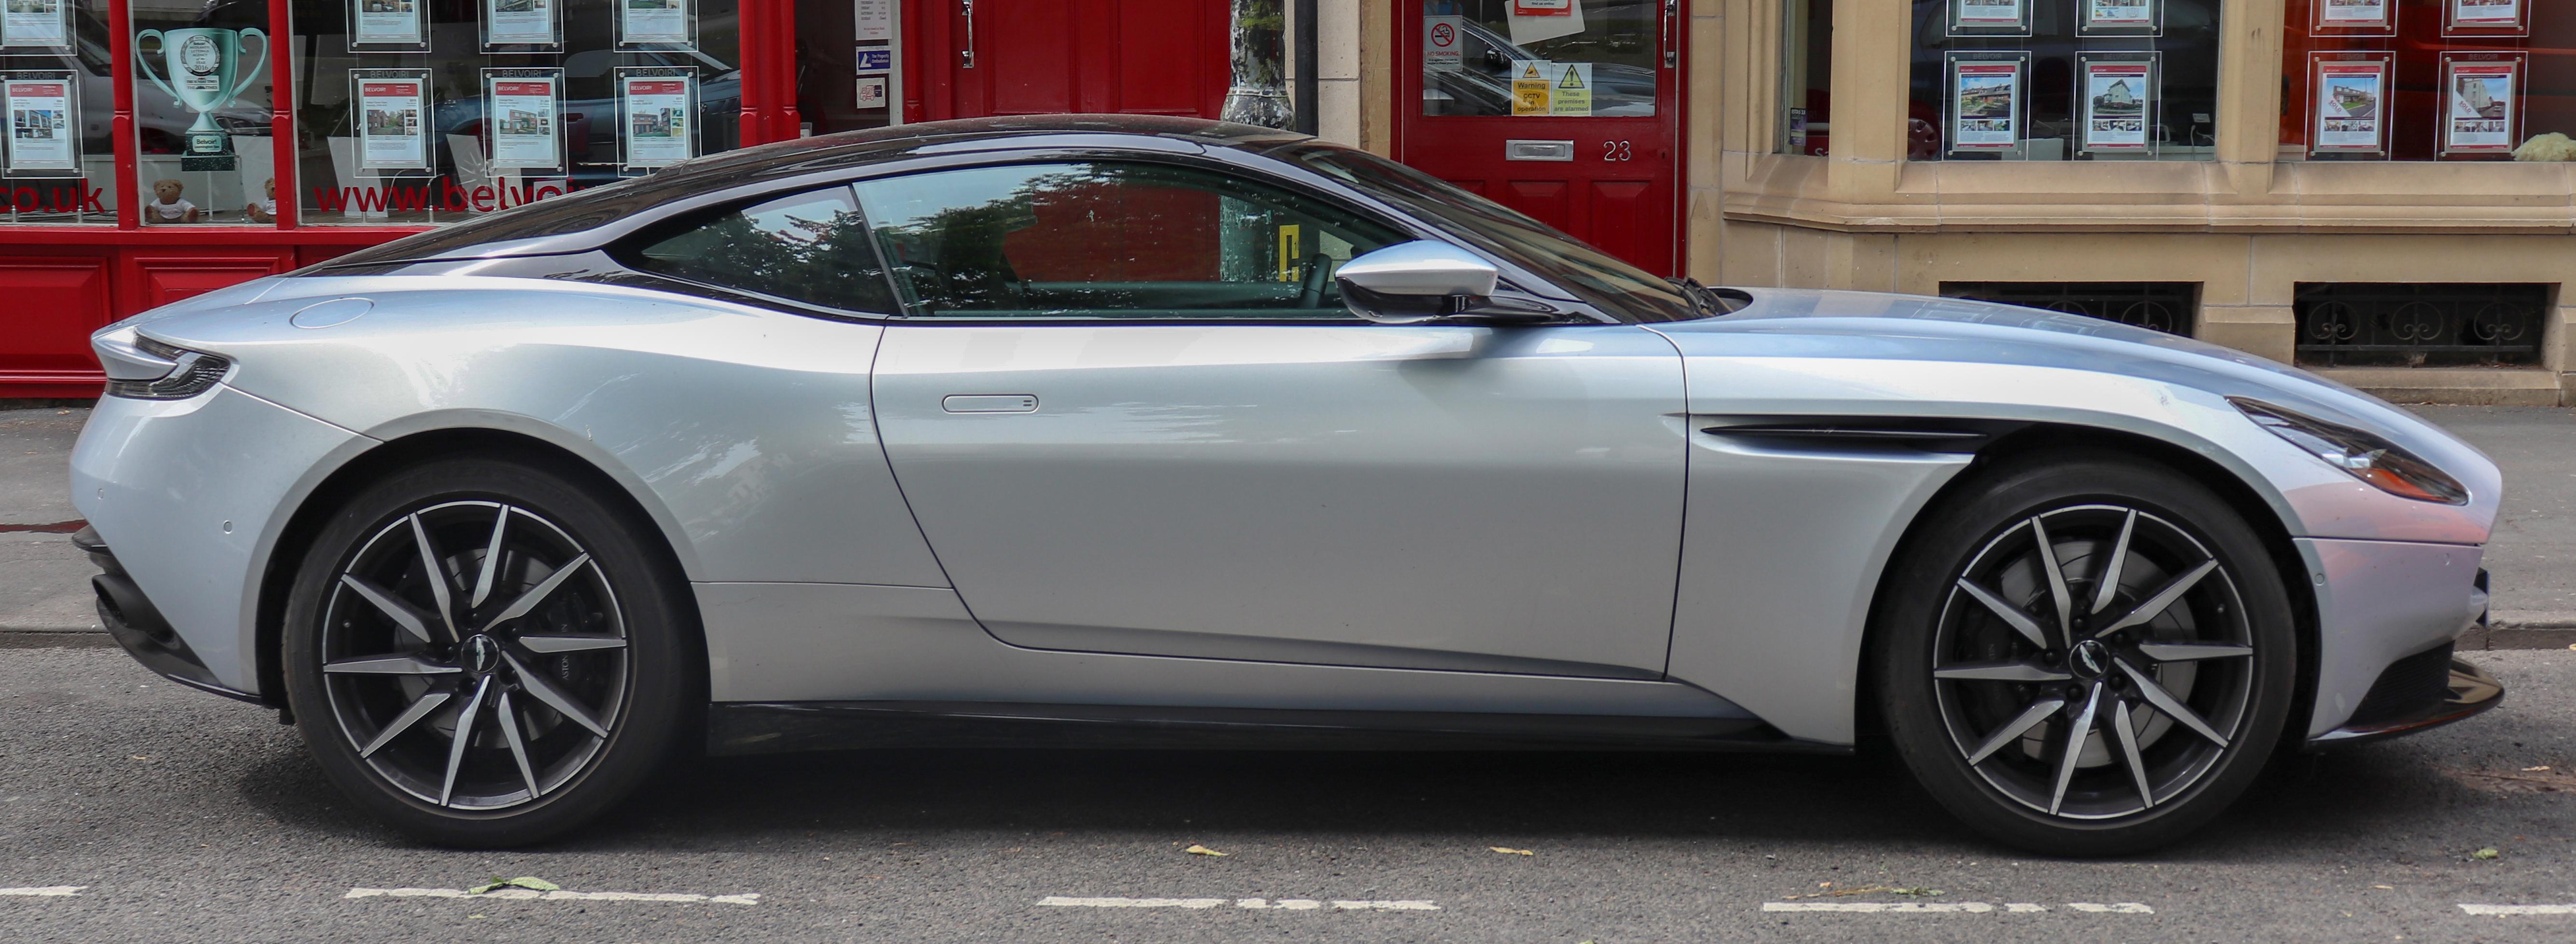 File 2018 Aston Martin Db11 V8 Automatic 4 0 Side Jpg Wikimedia Commons